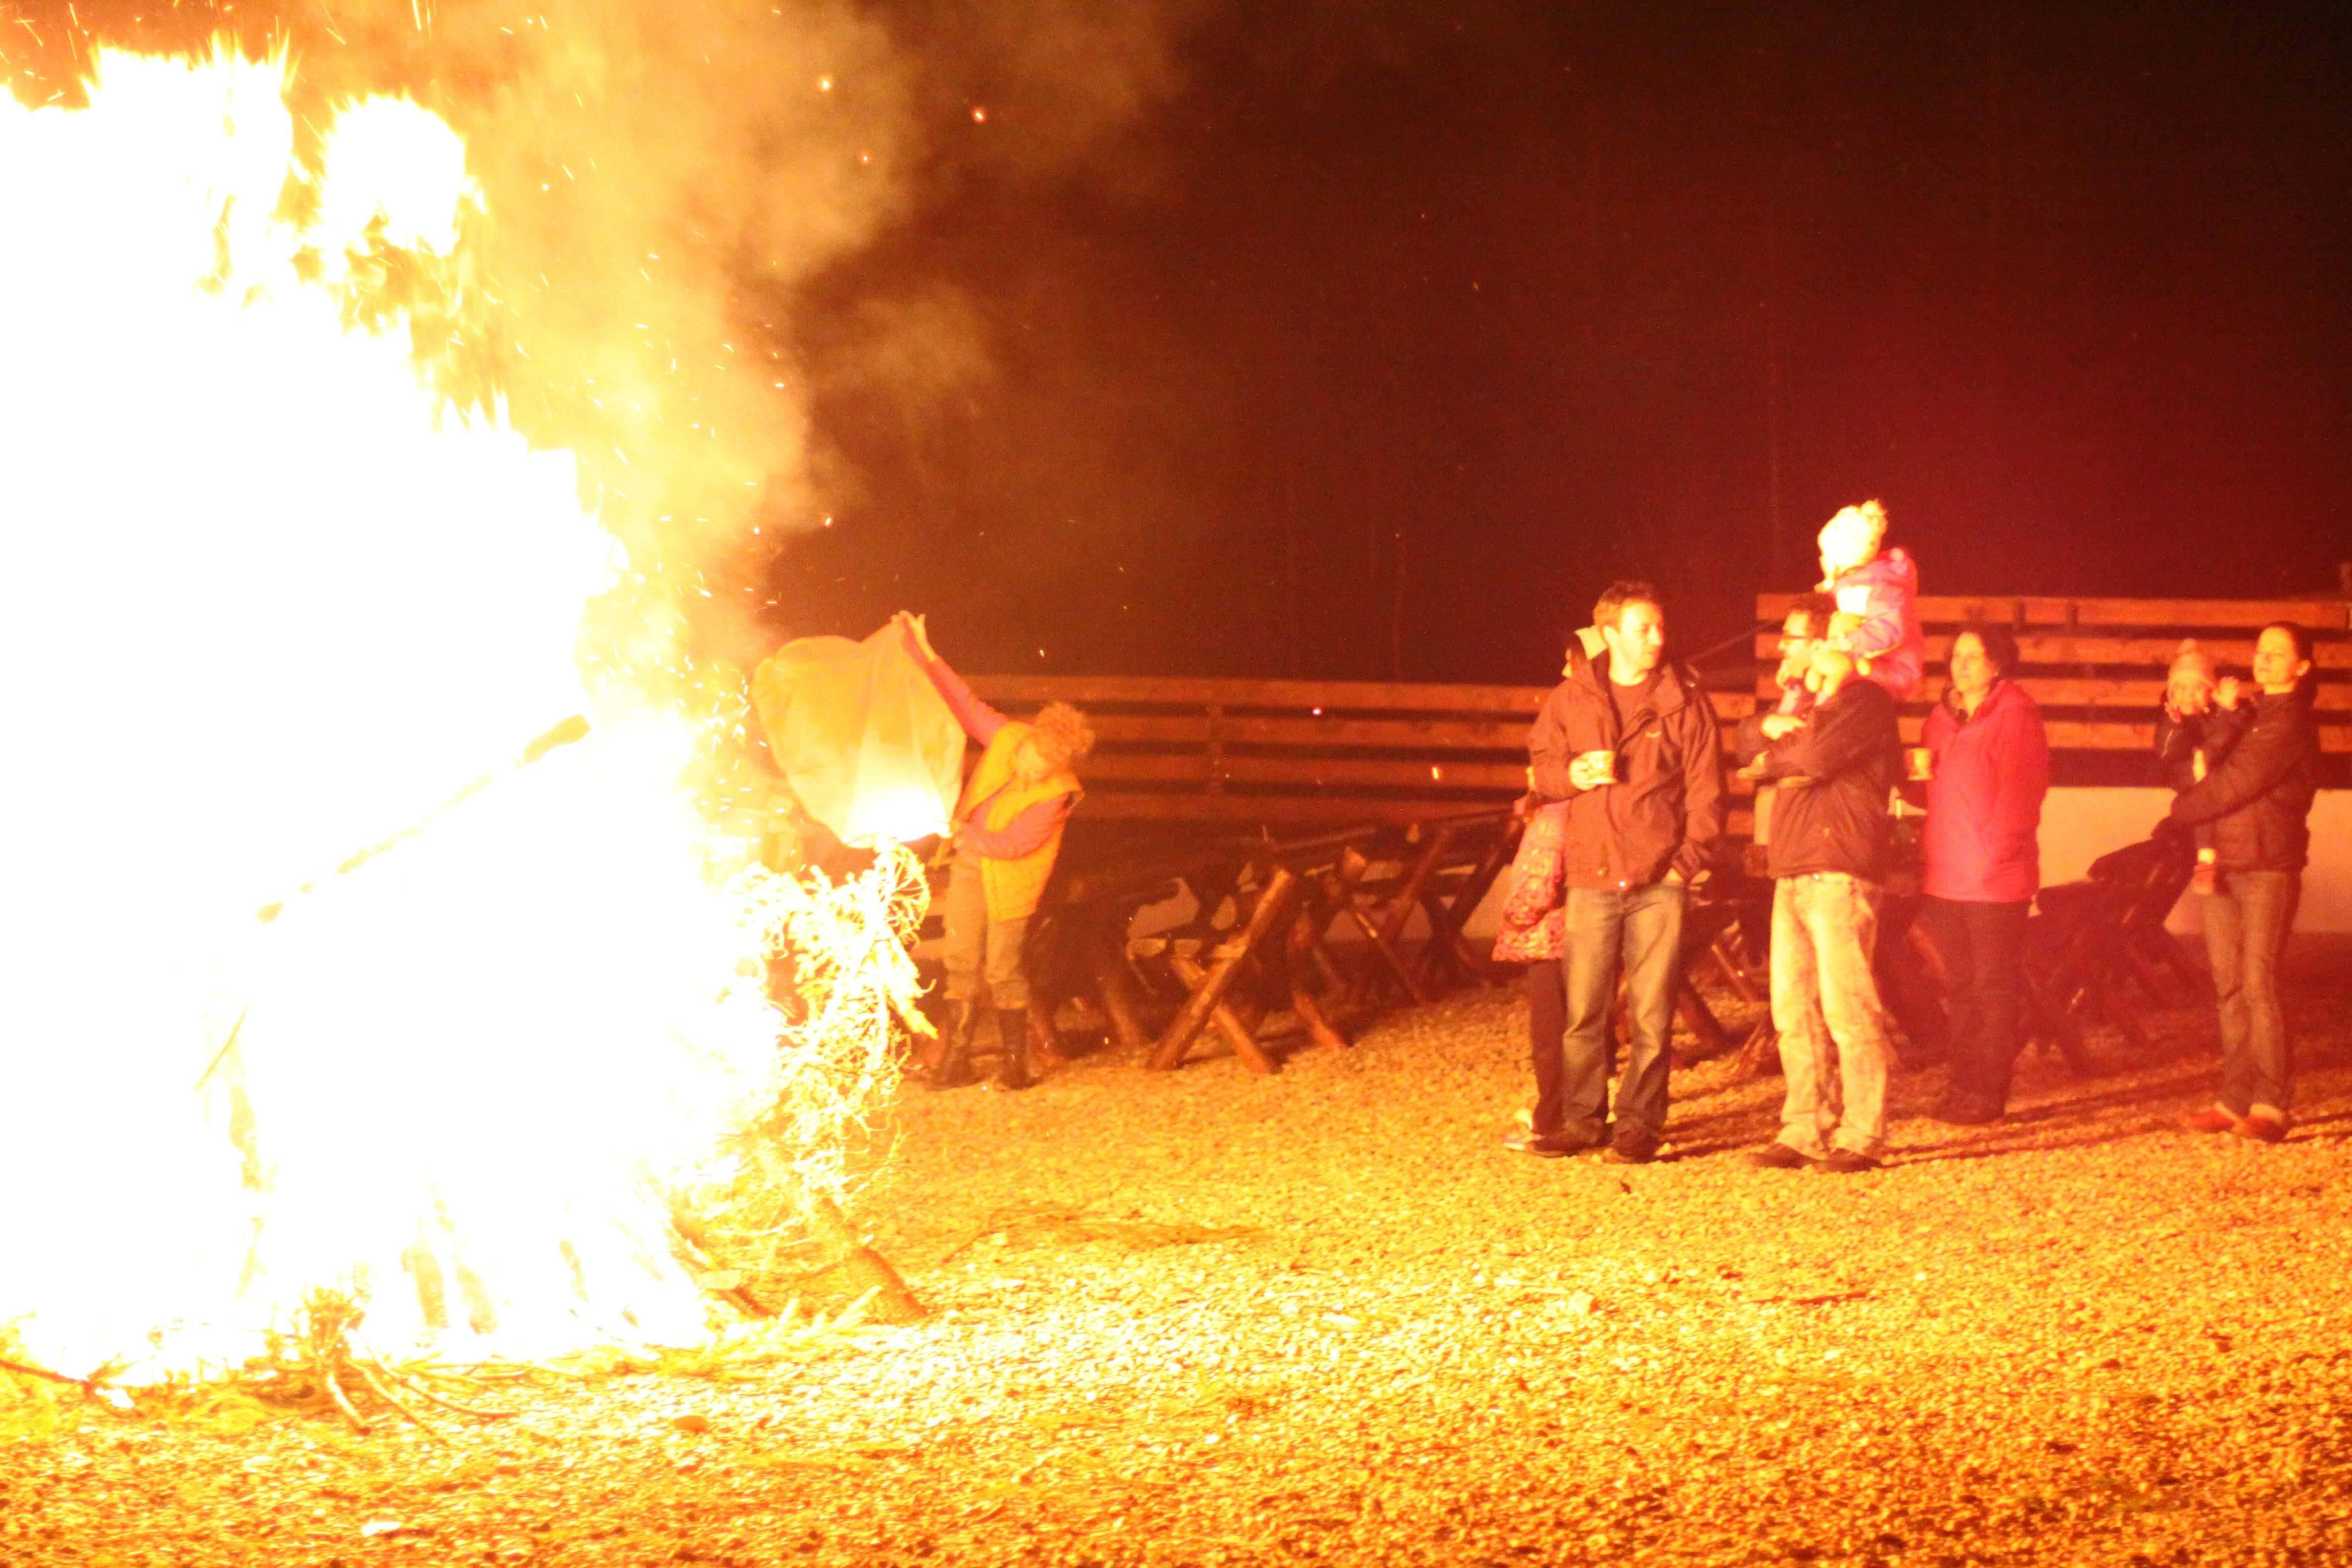 foc tabara aventura cazare baisoara pensiune skiland ieftin cluj munte gratuit traditional